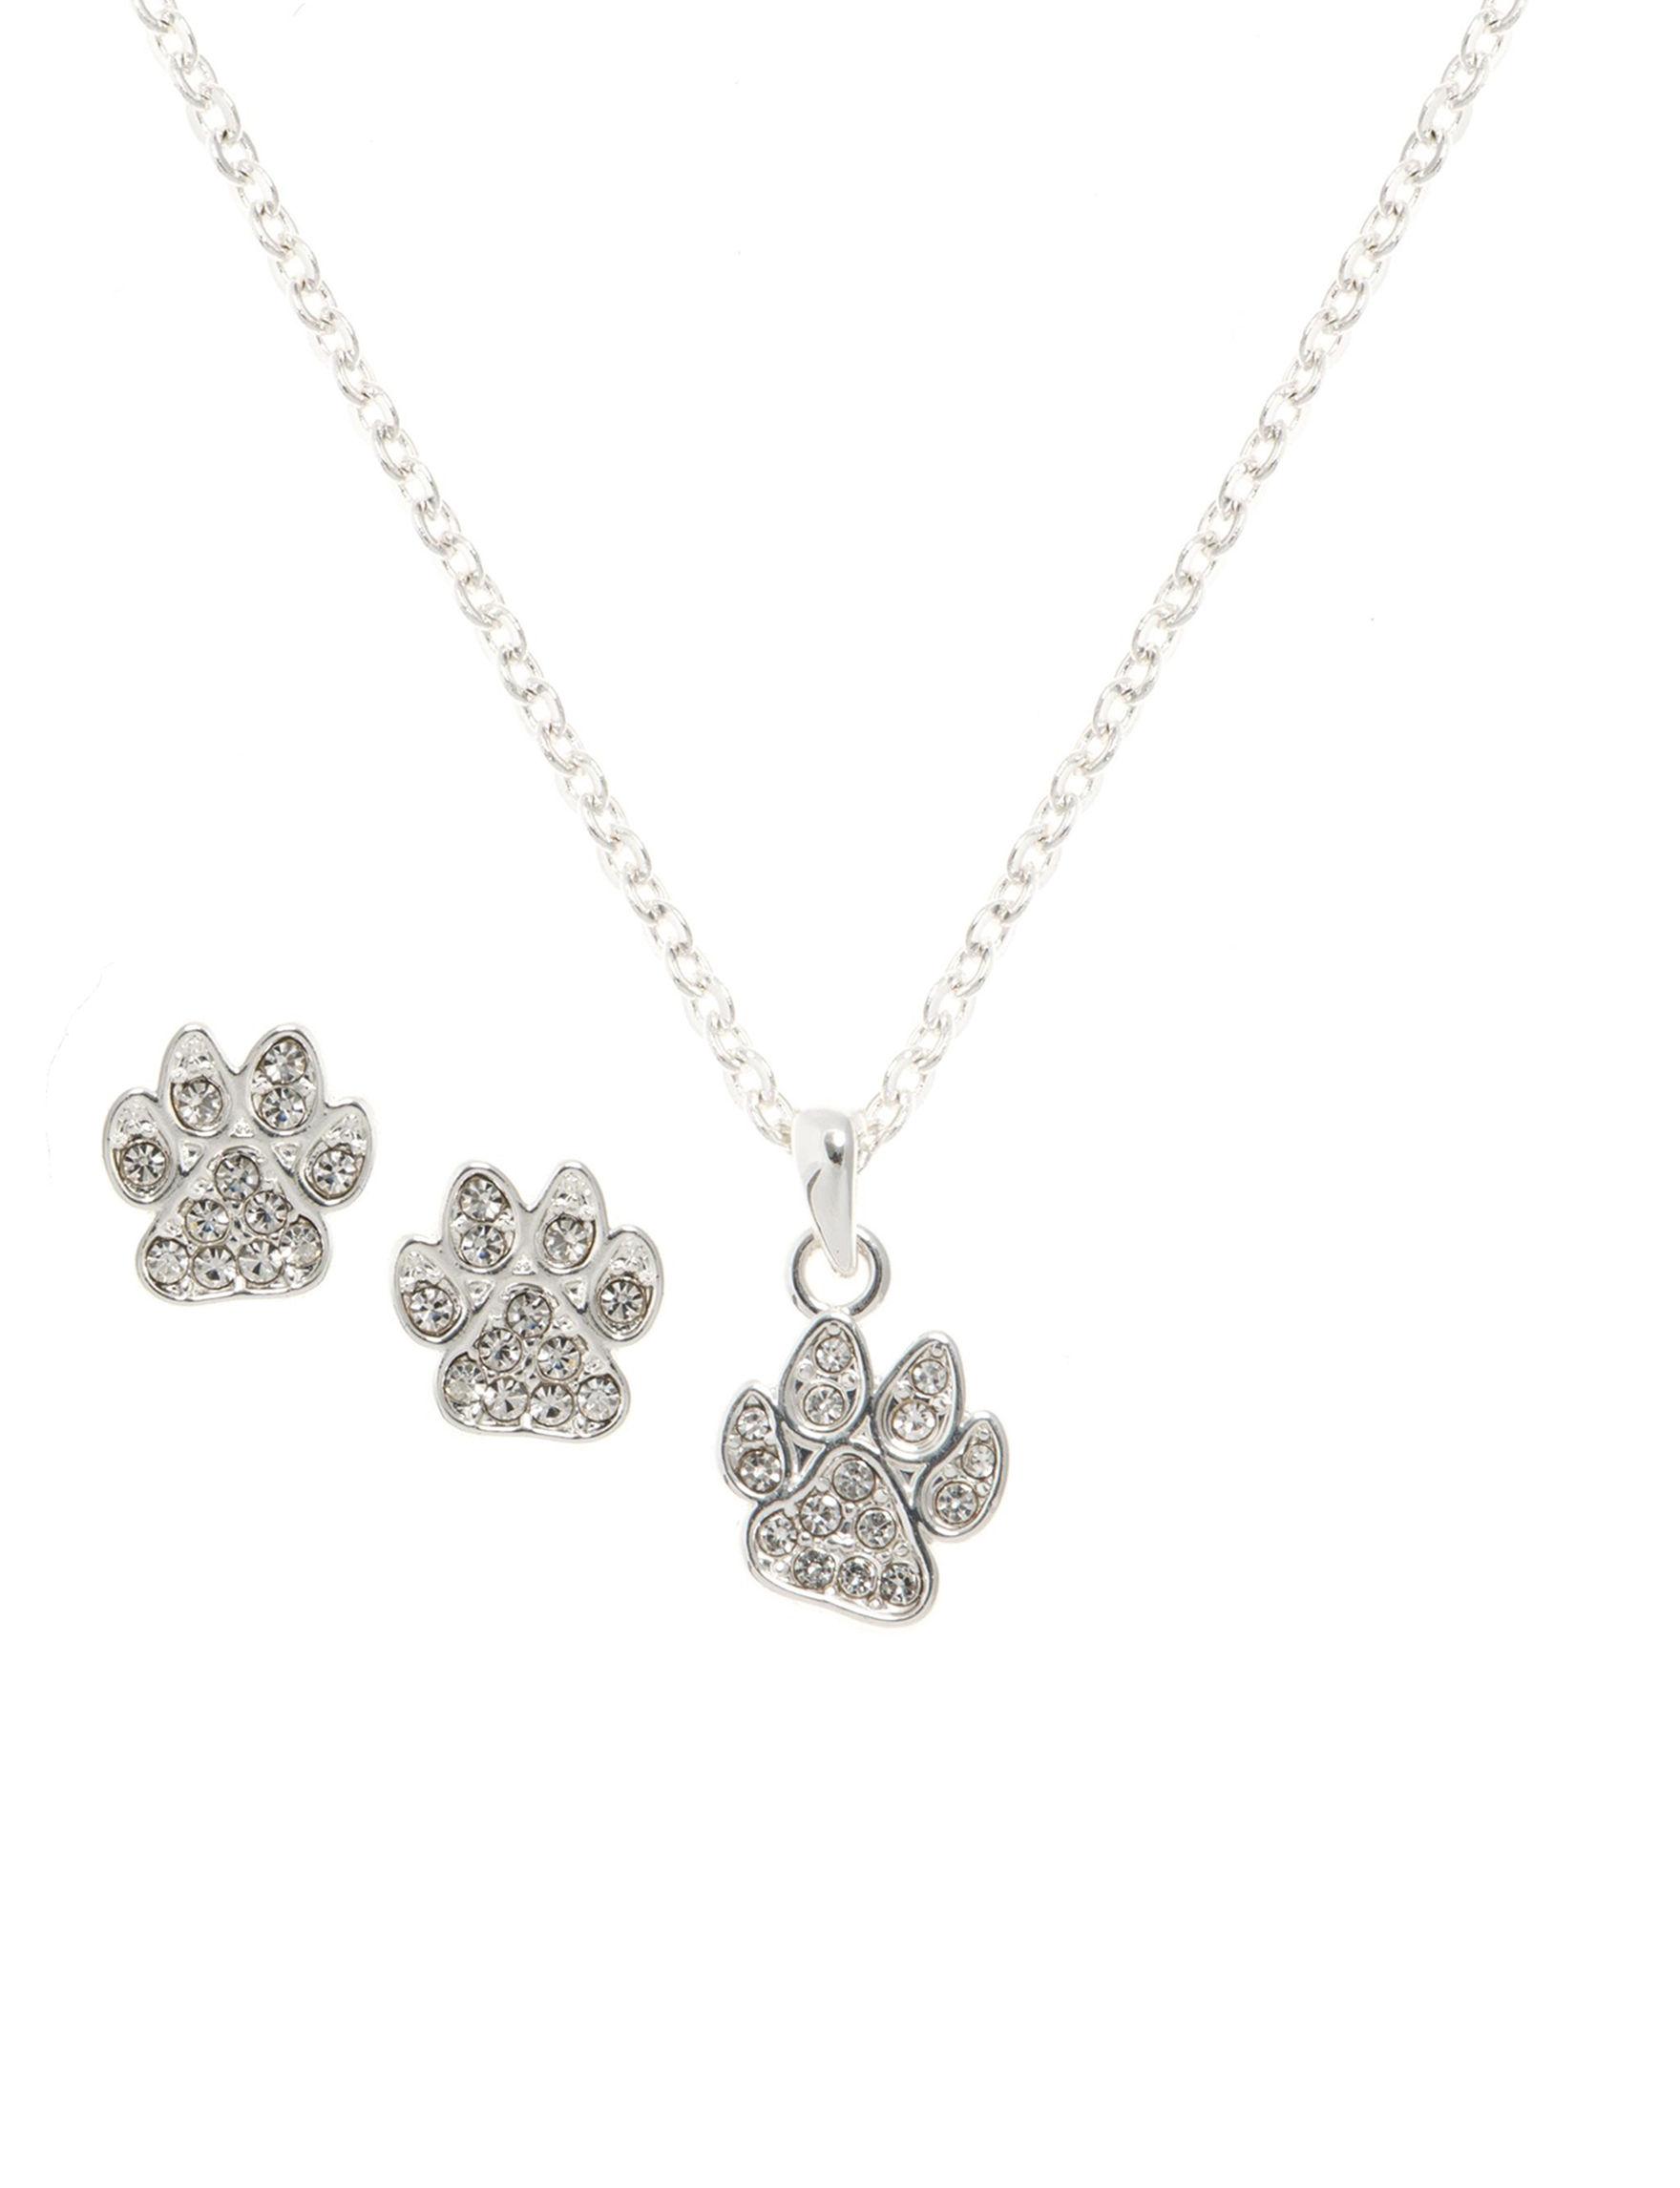 Pet Friends Silver Jewelry Sets Fashion Jewelry